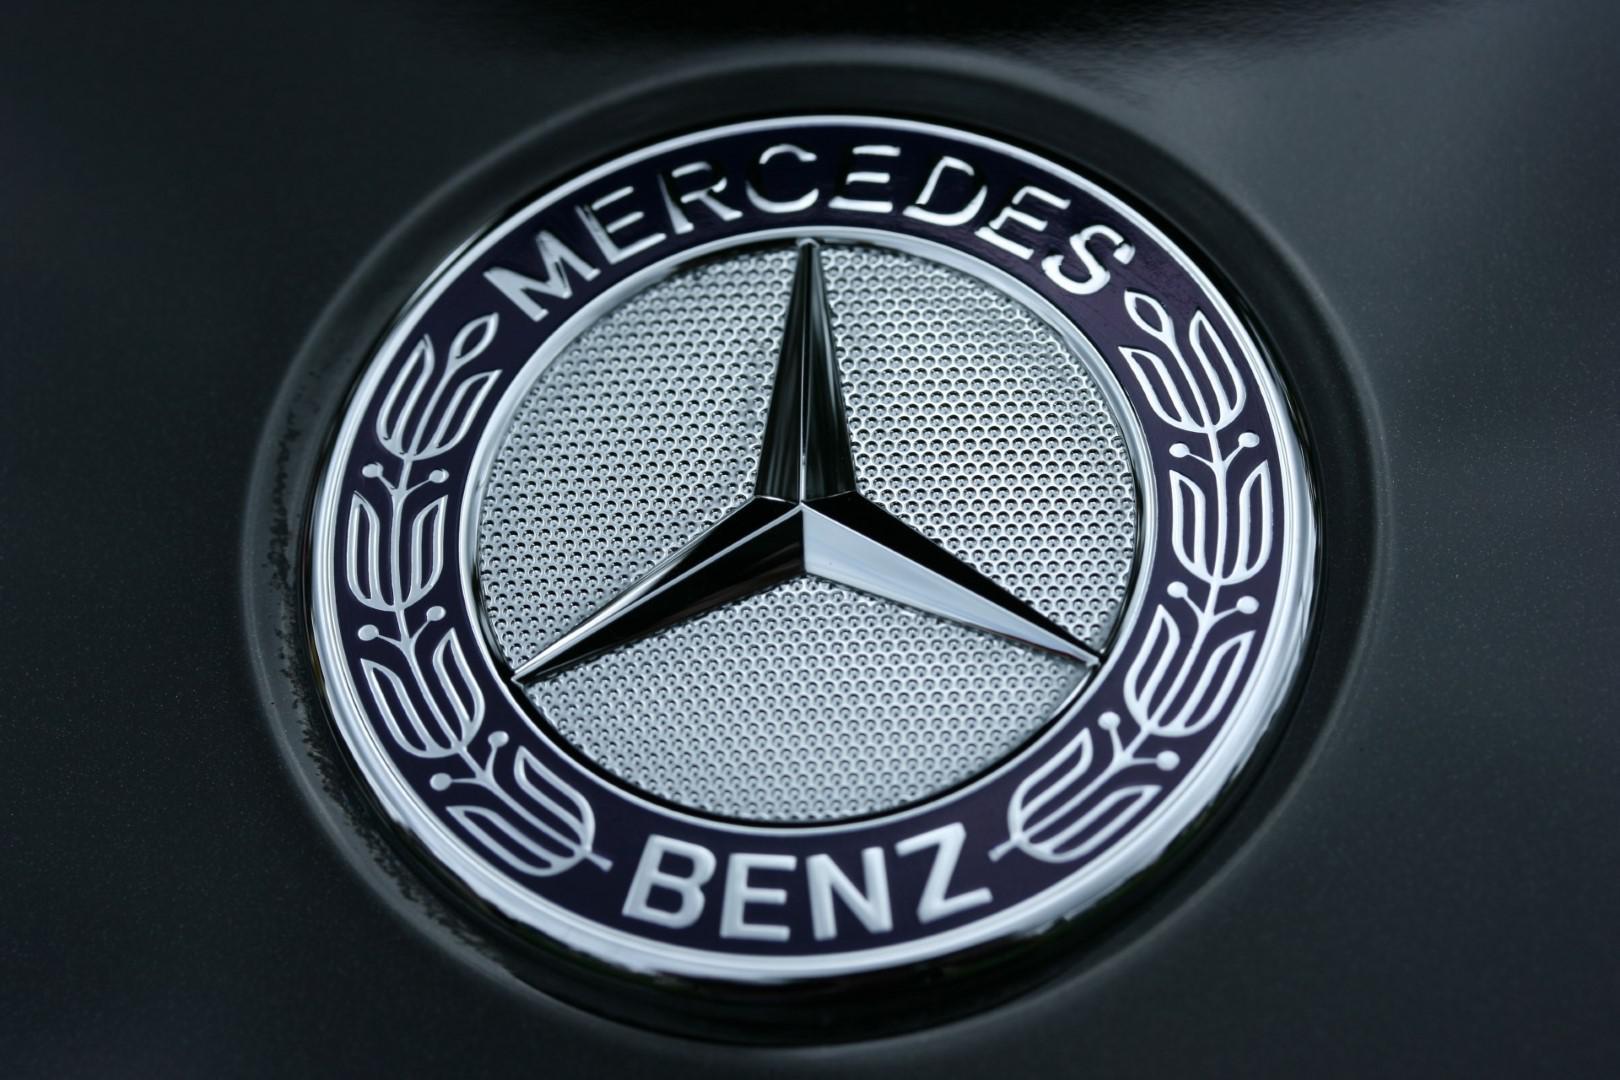 Exclu: À savoir concernant la marque Mercedes …